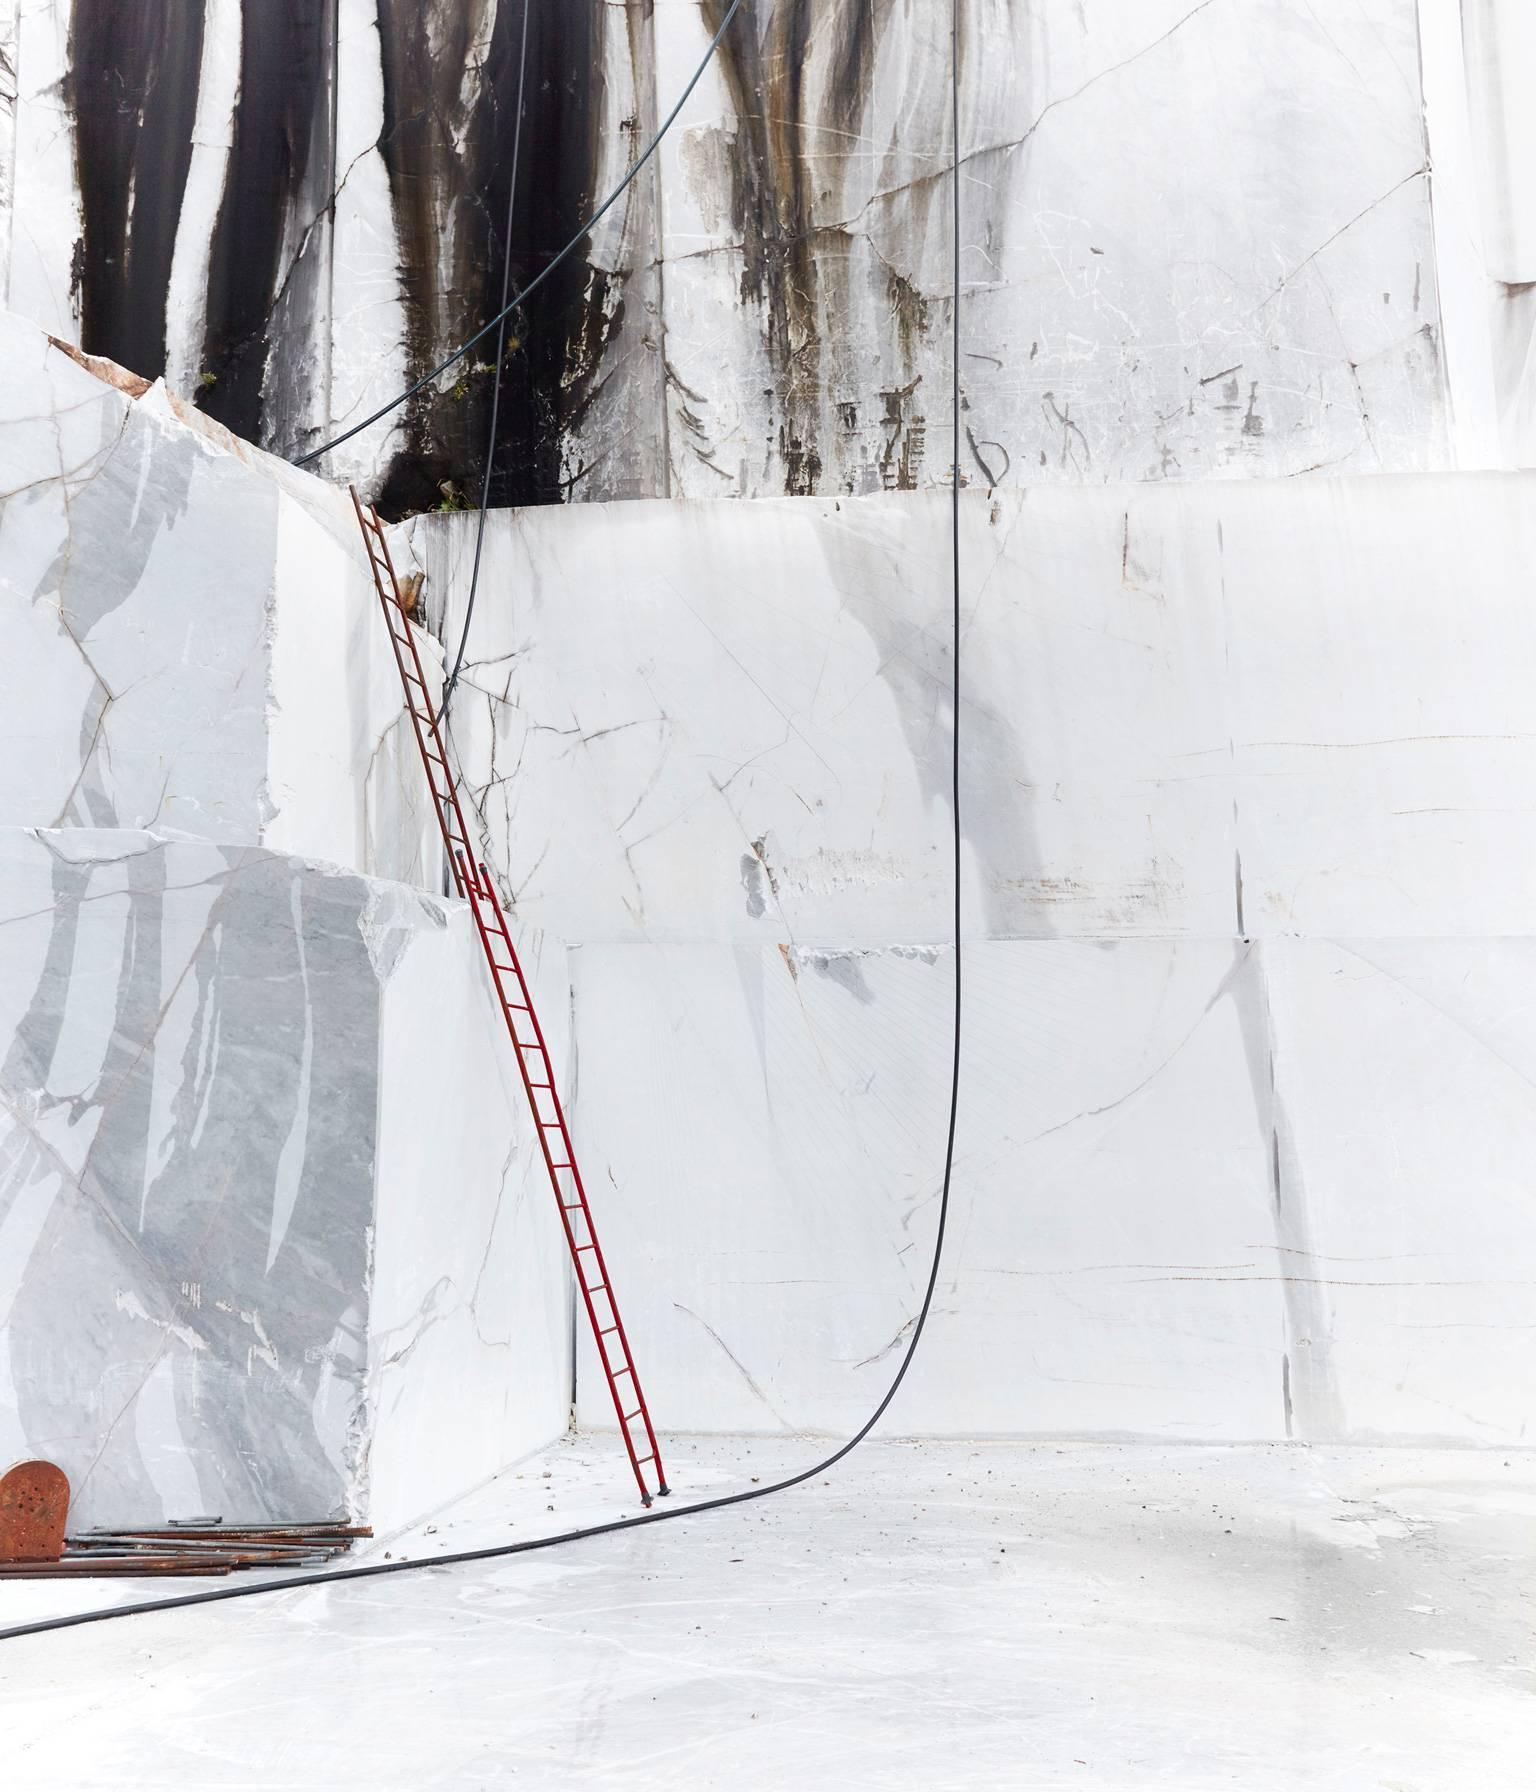 Carrara II - large format photograph of iconic Italian marble quarry